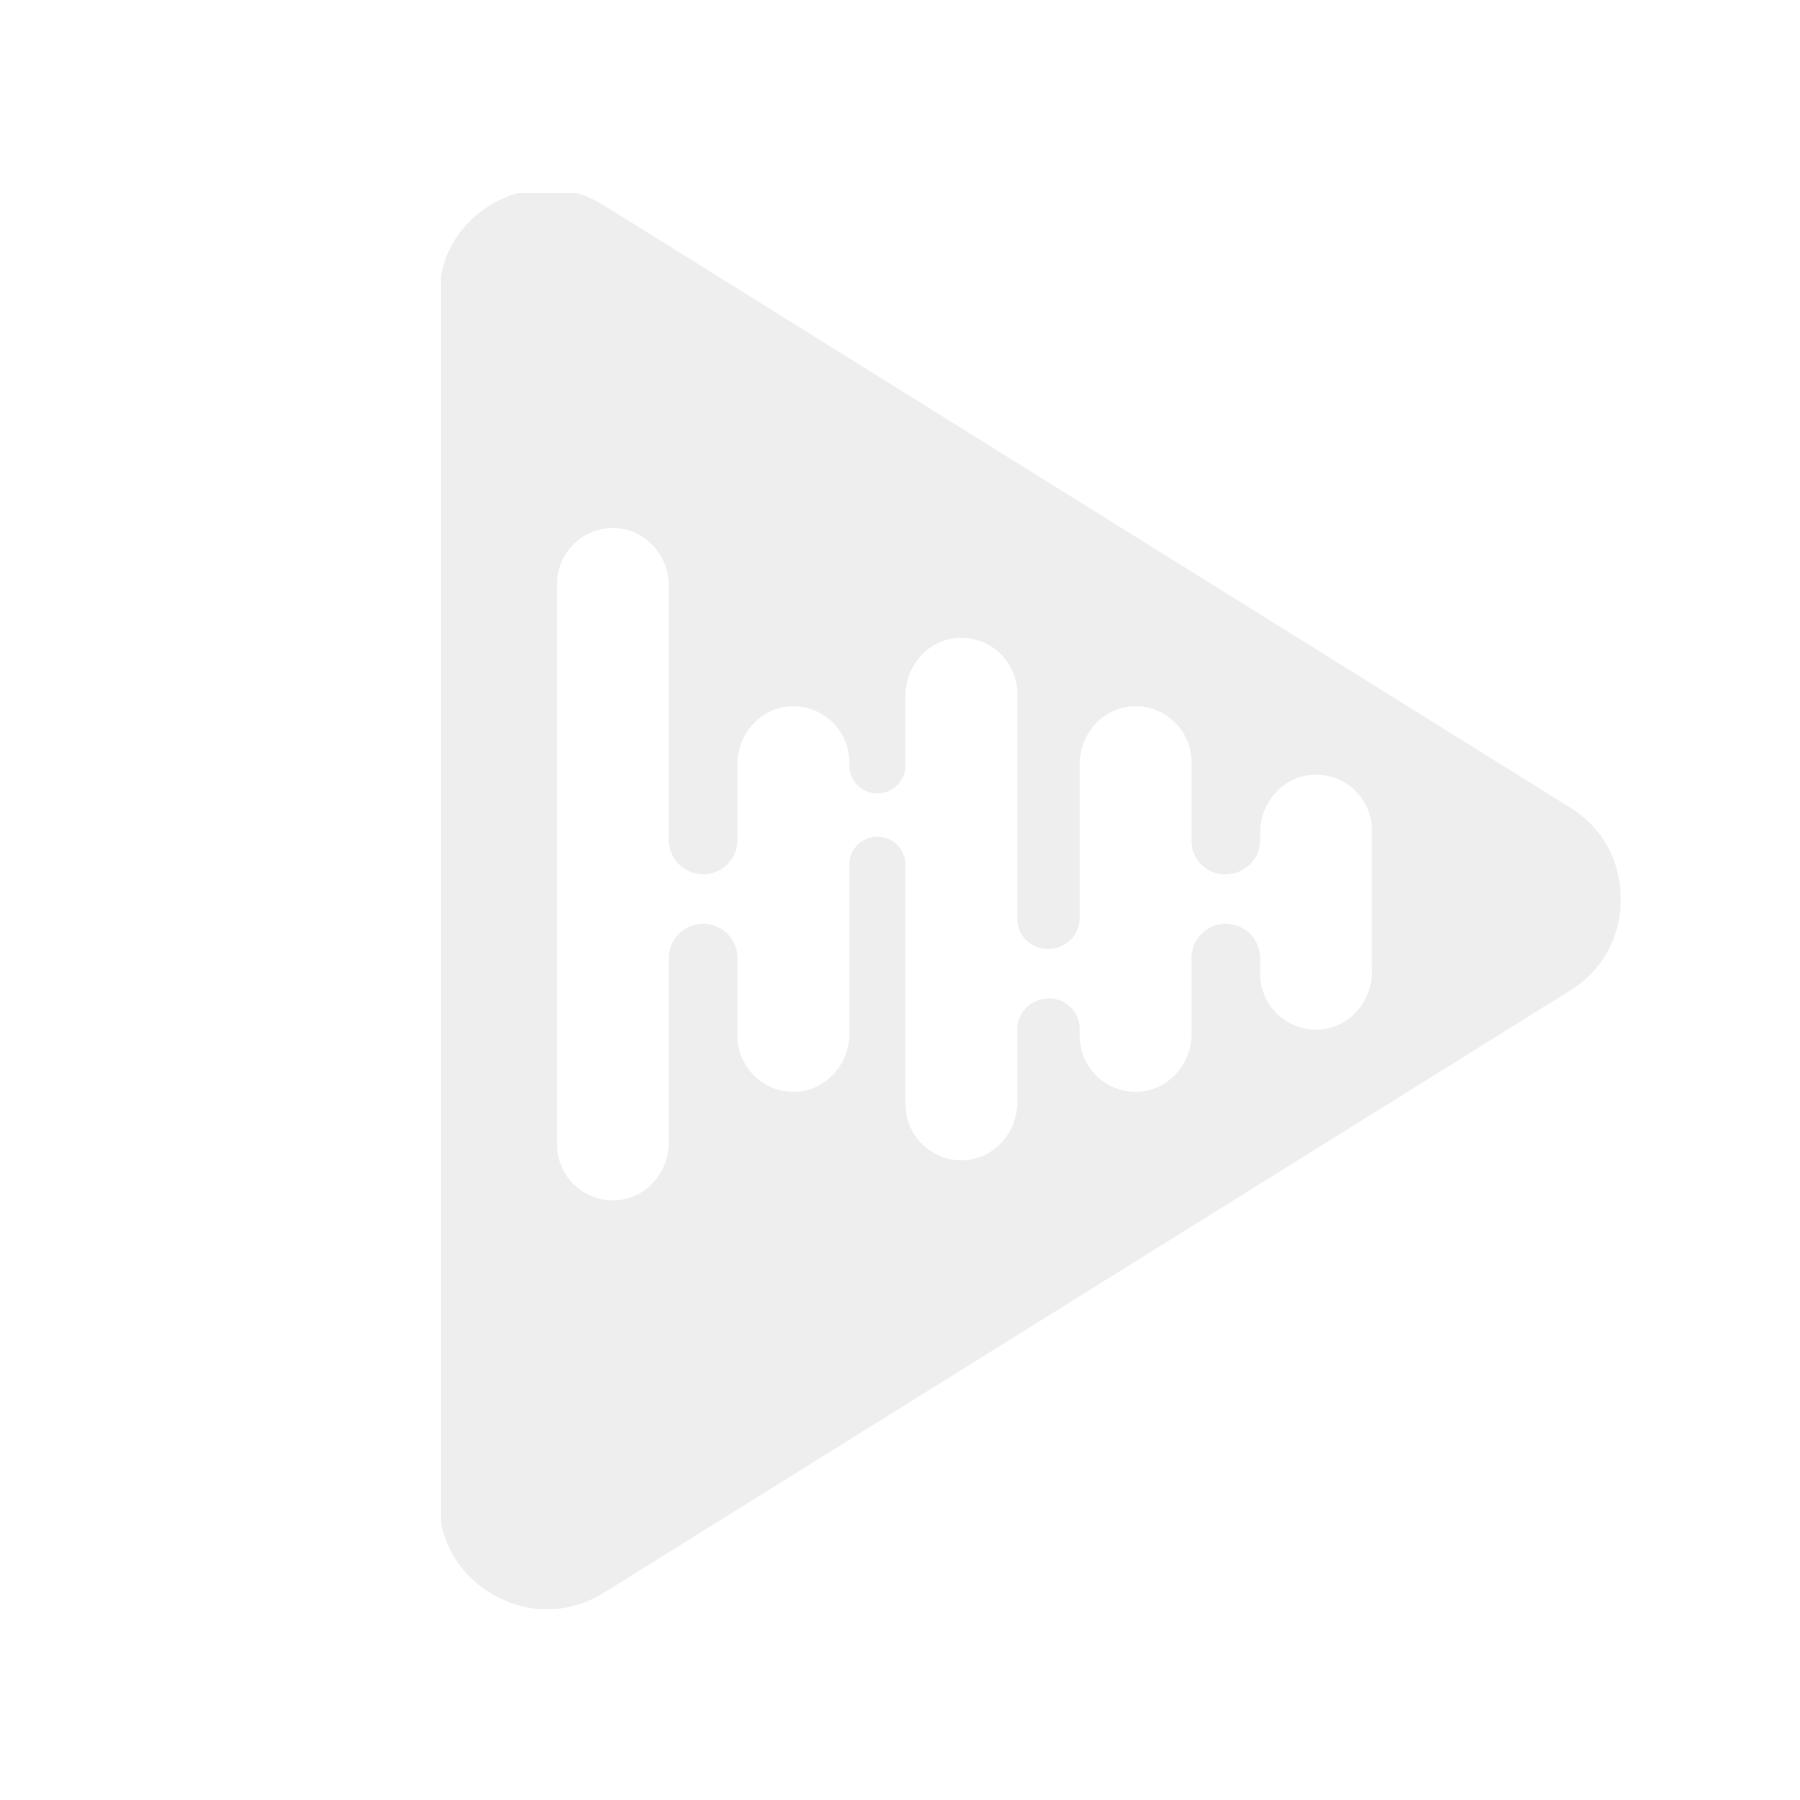 Phonocar 04925 - Dempeull, 0.7m2